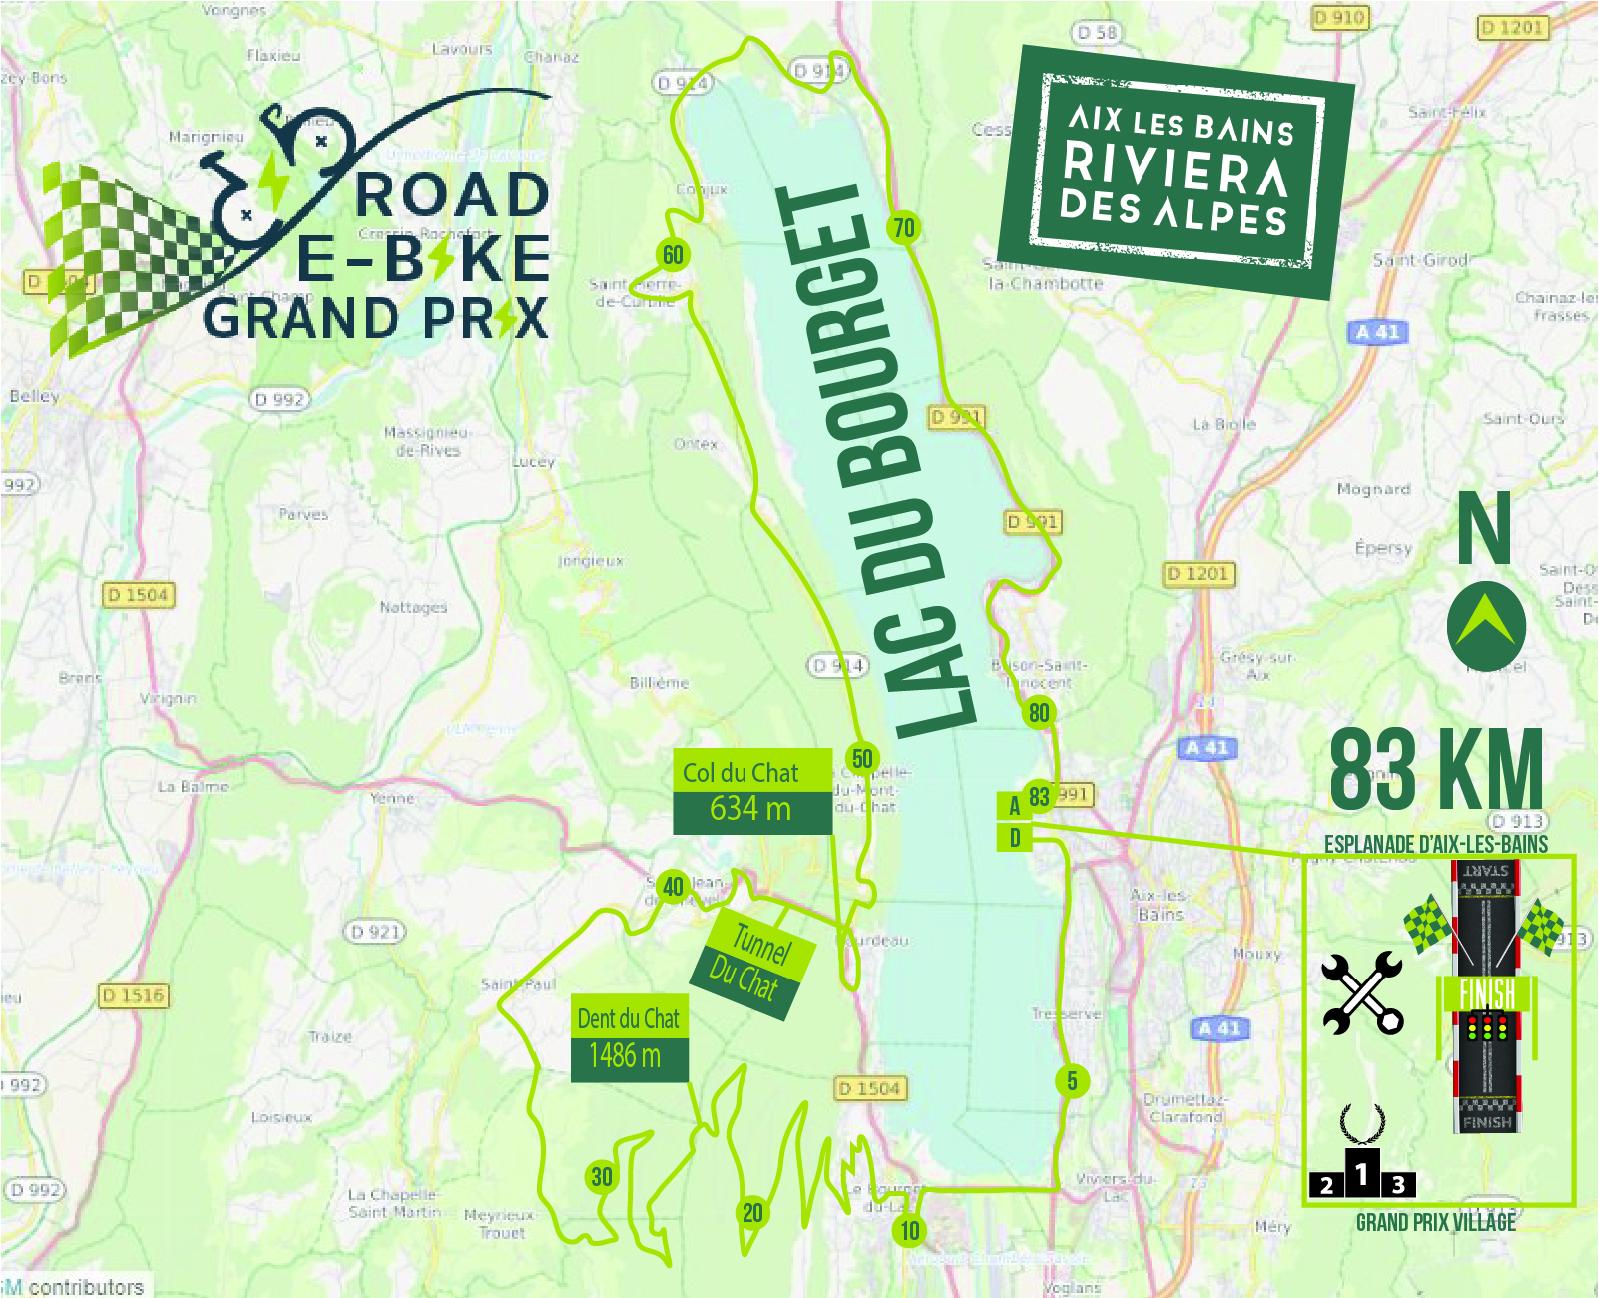 1/2 Road E-bike Grand Prix : 83 km